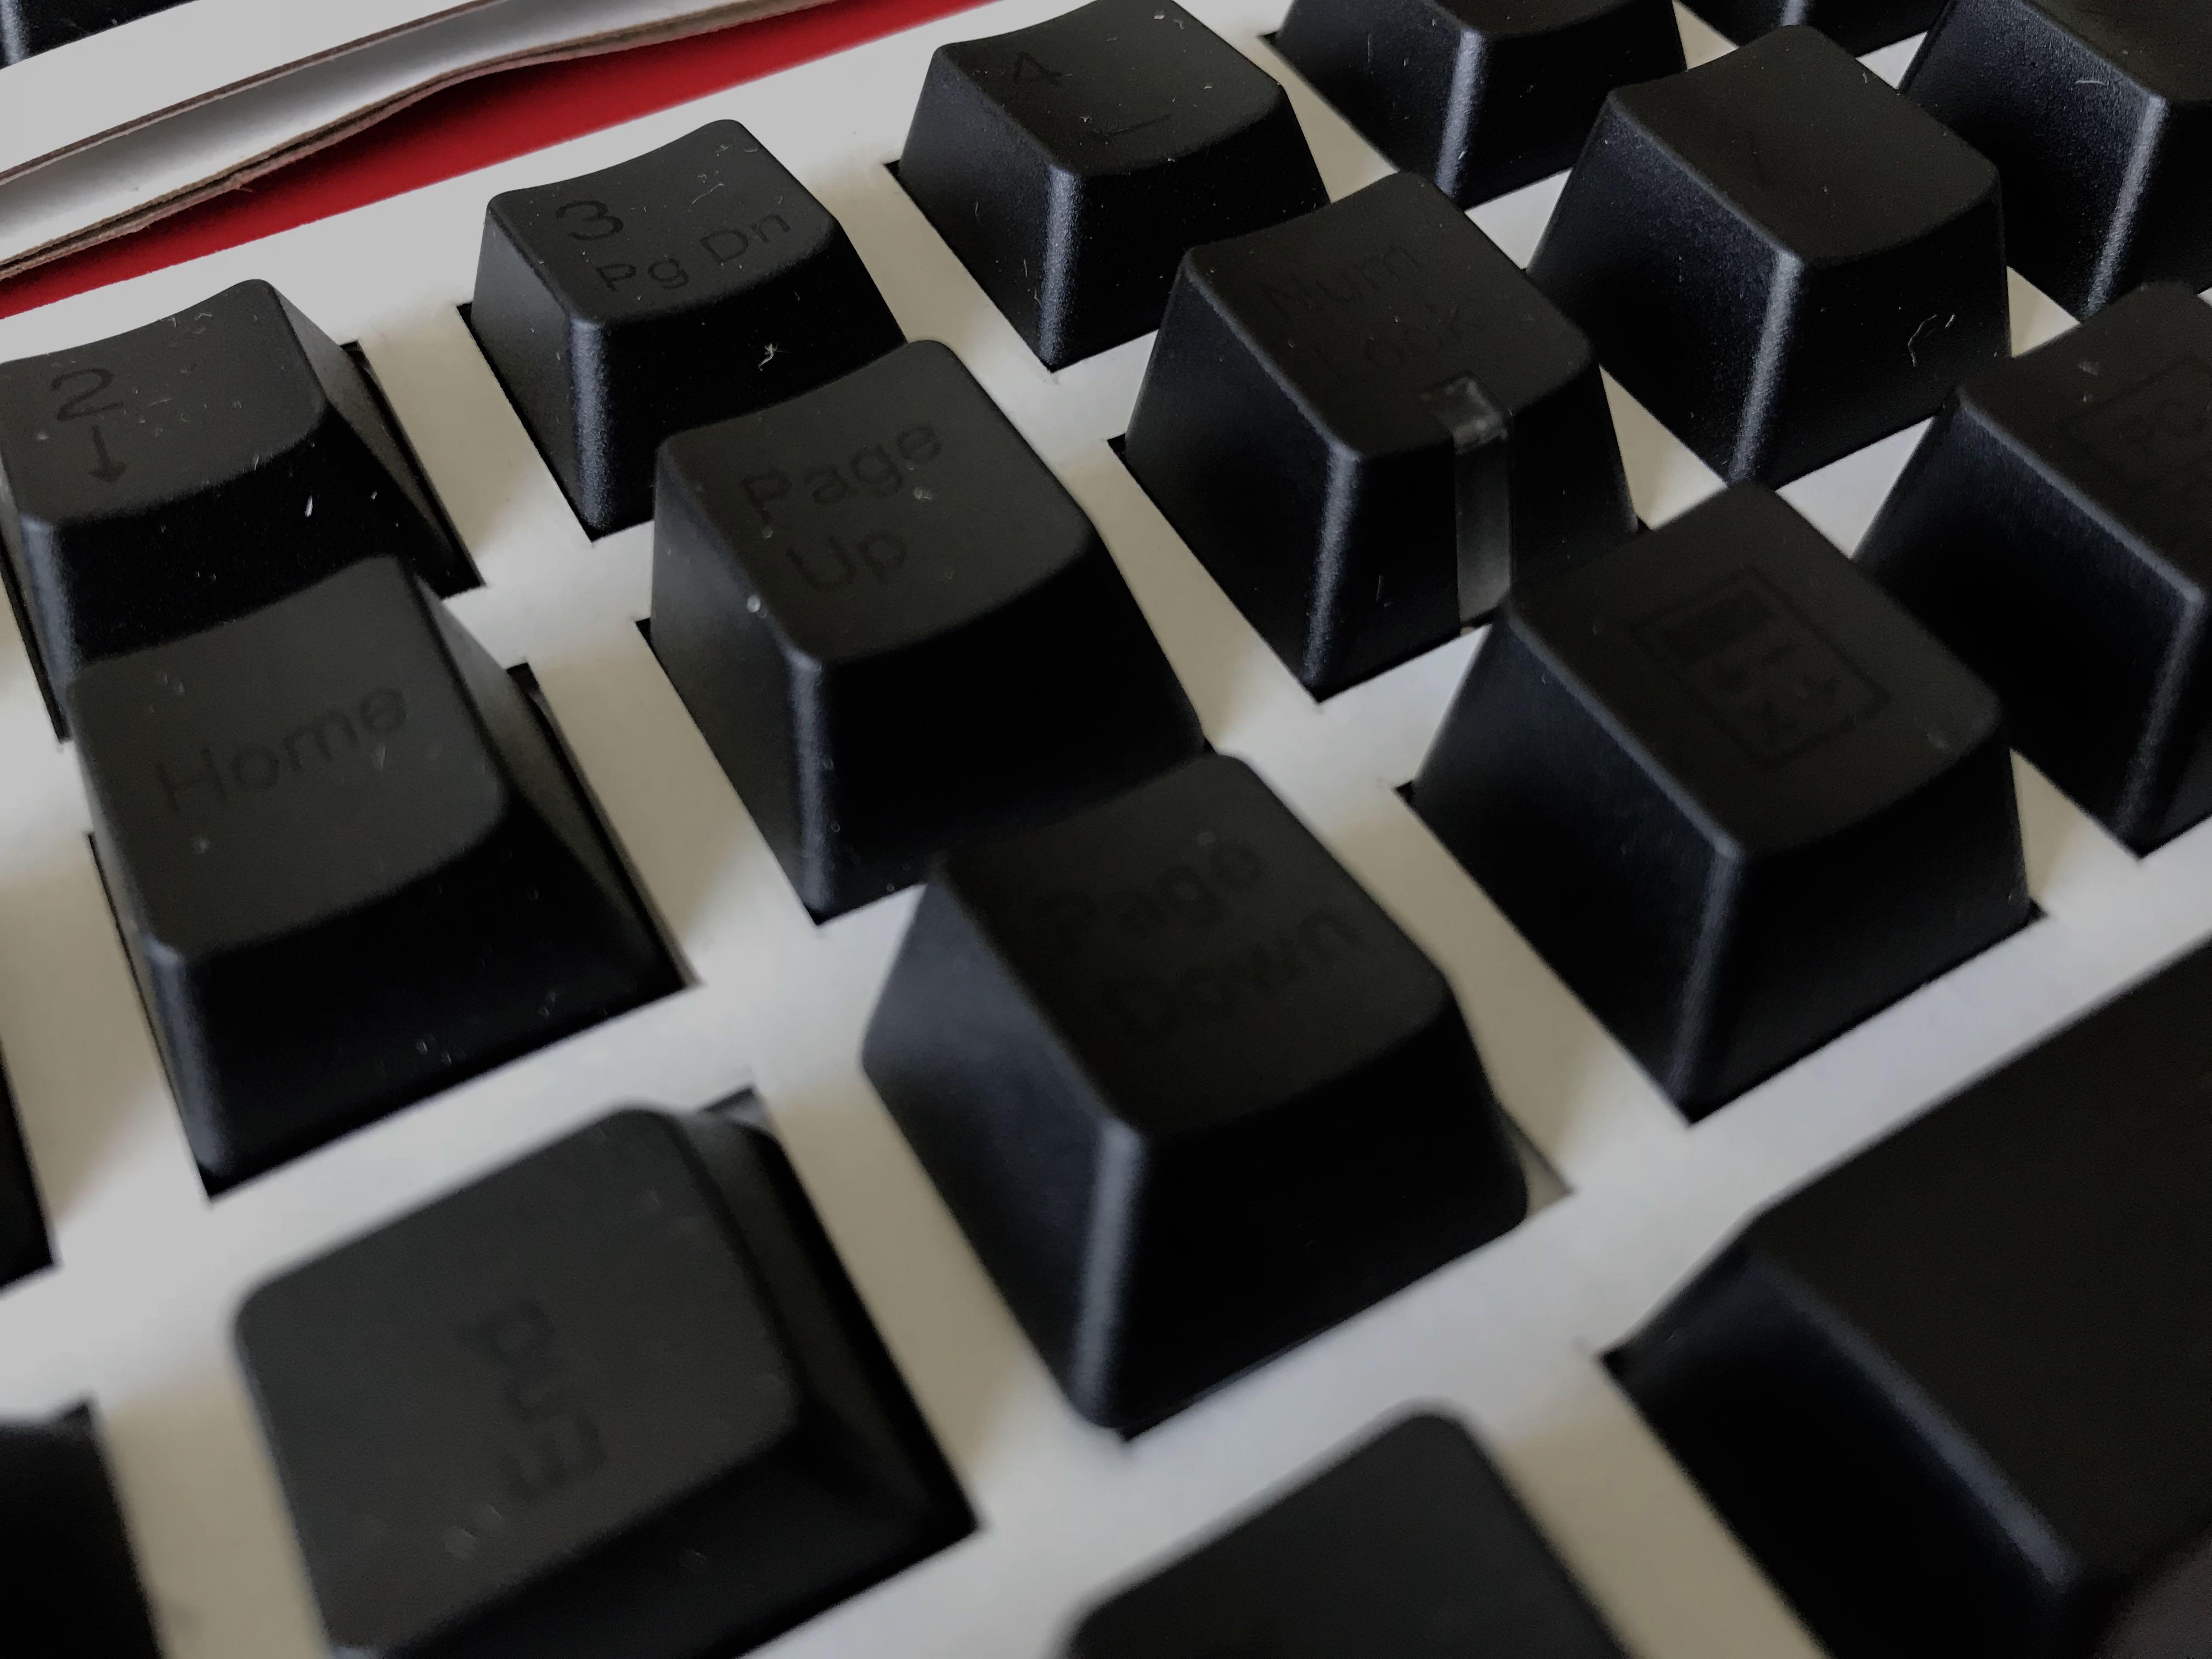 PBT Cherry MX Keycap set - black on black by ducky